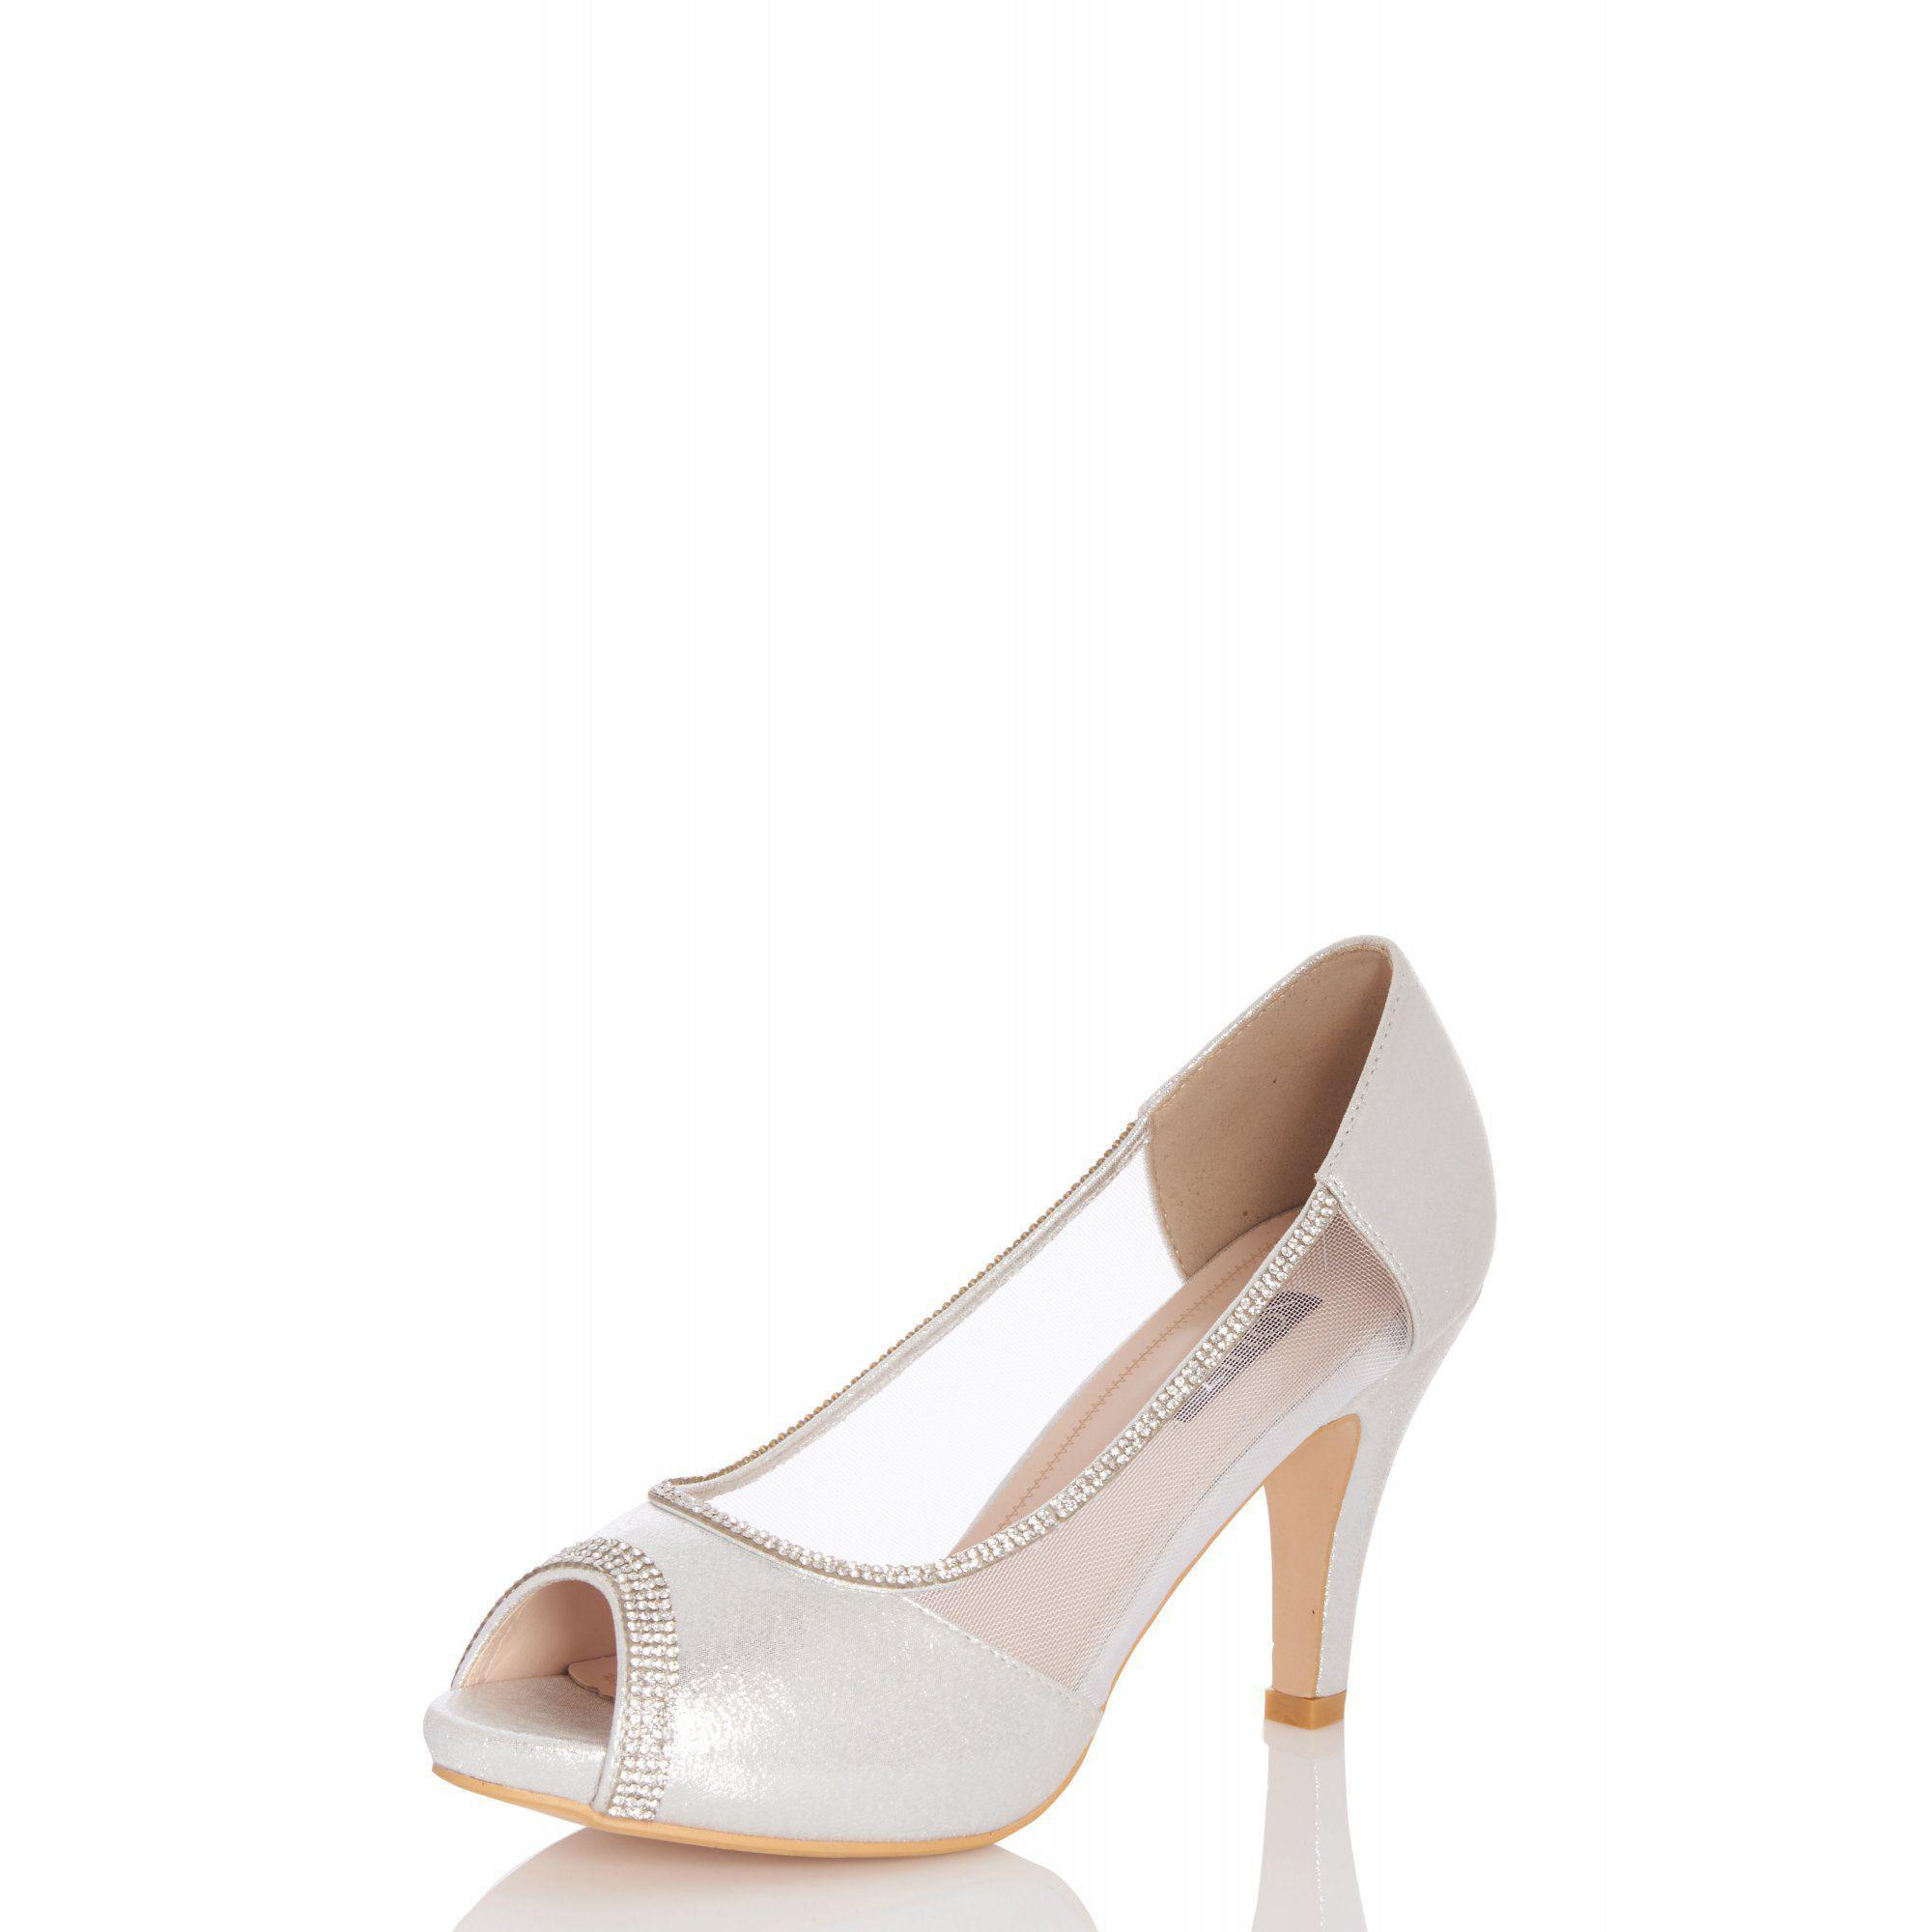 47d1c3c552a Quiz - Metallic Silver Shimmer Peep Toe Low Heel Shoes - Lyst. View  fullscreen